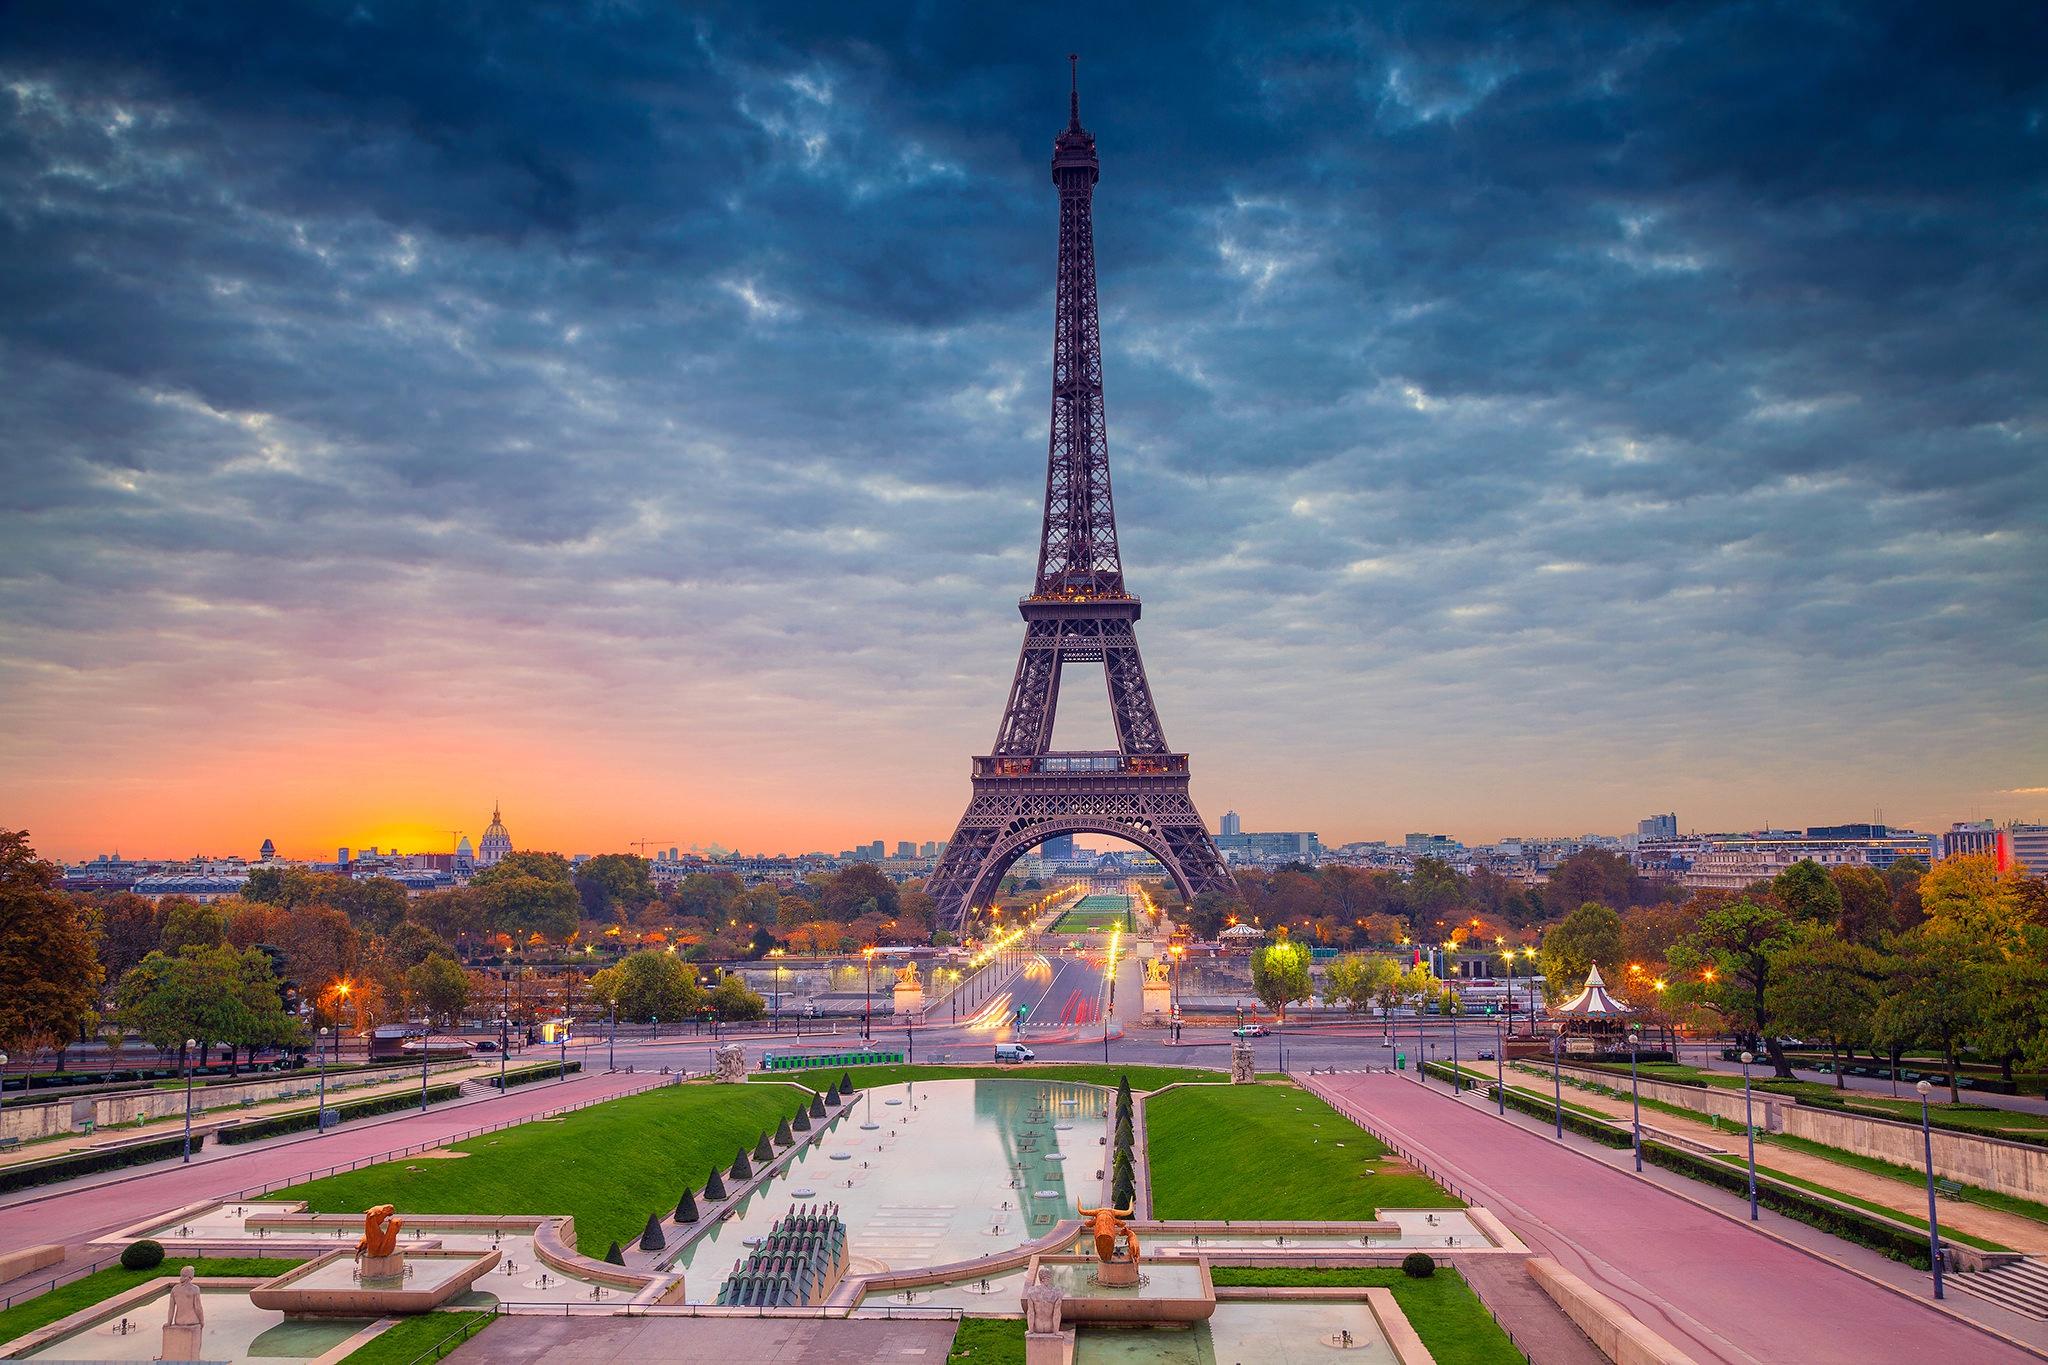 1920x1080 Eiffel Tower Paris Beautiful View Laptop Full Hd